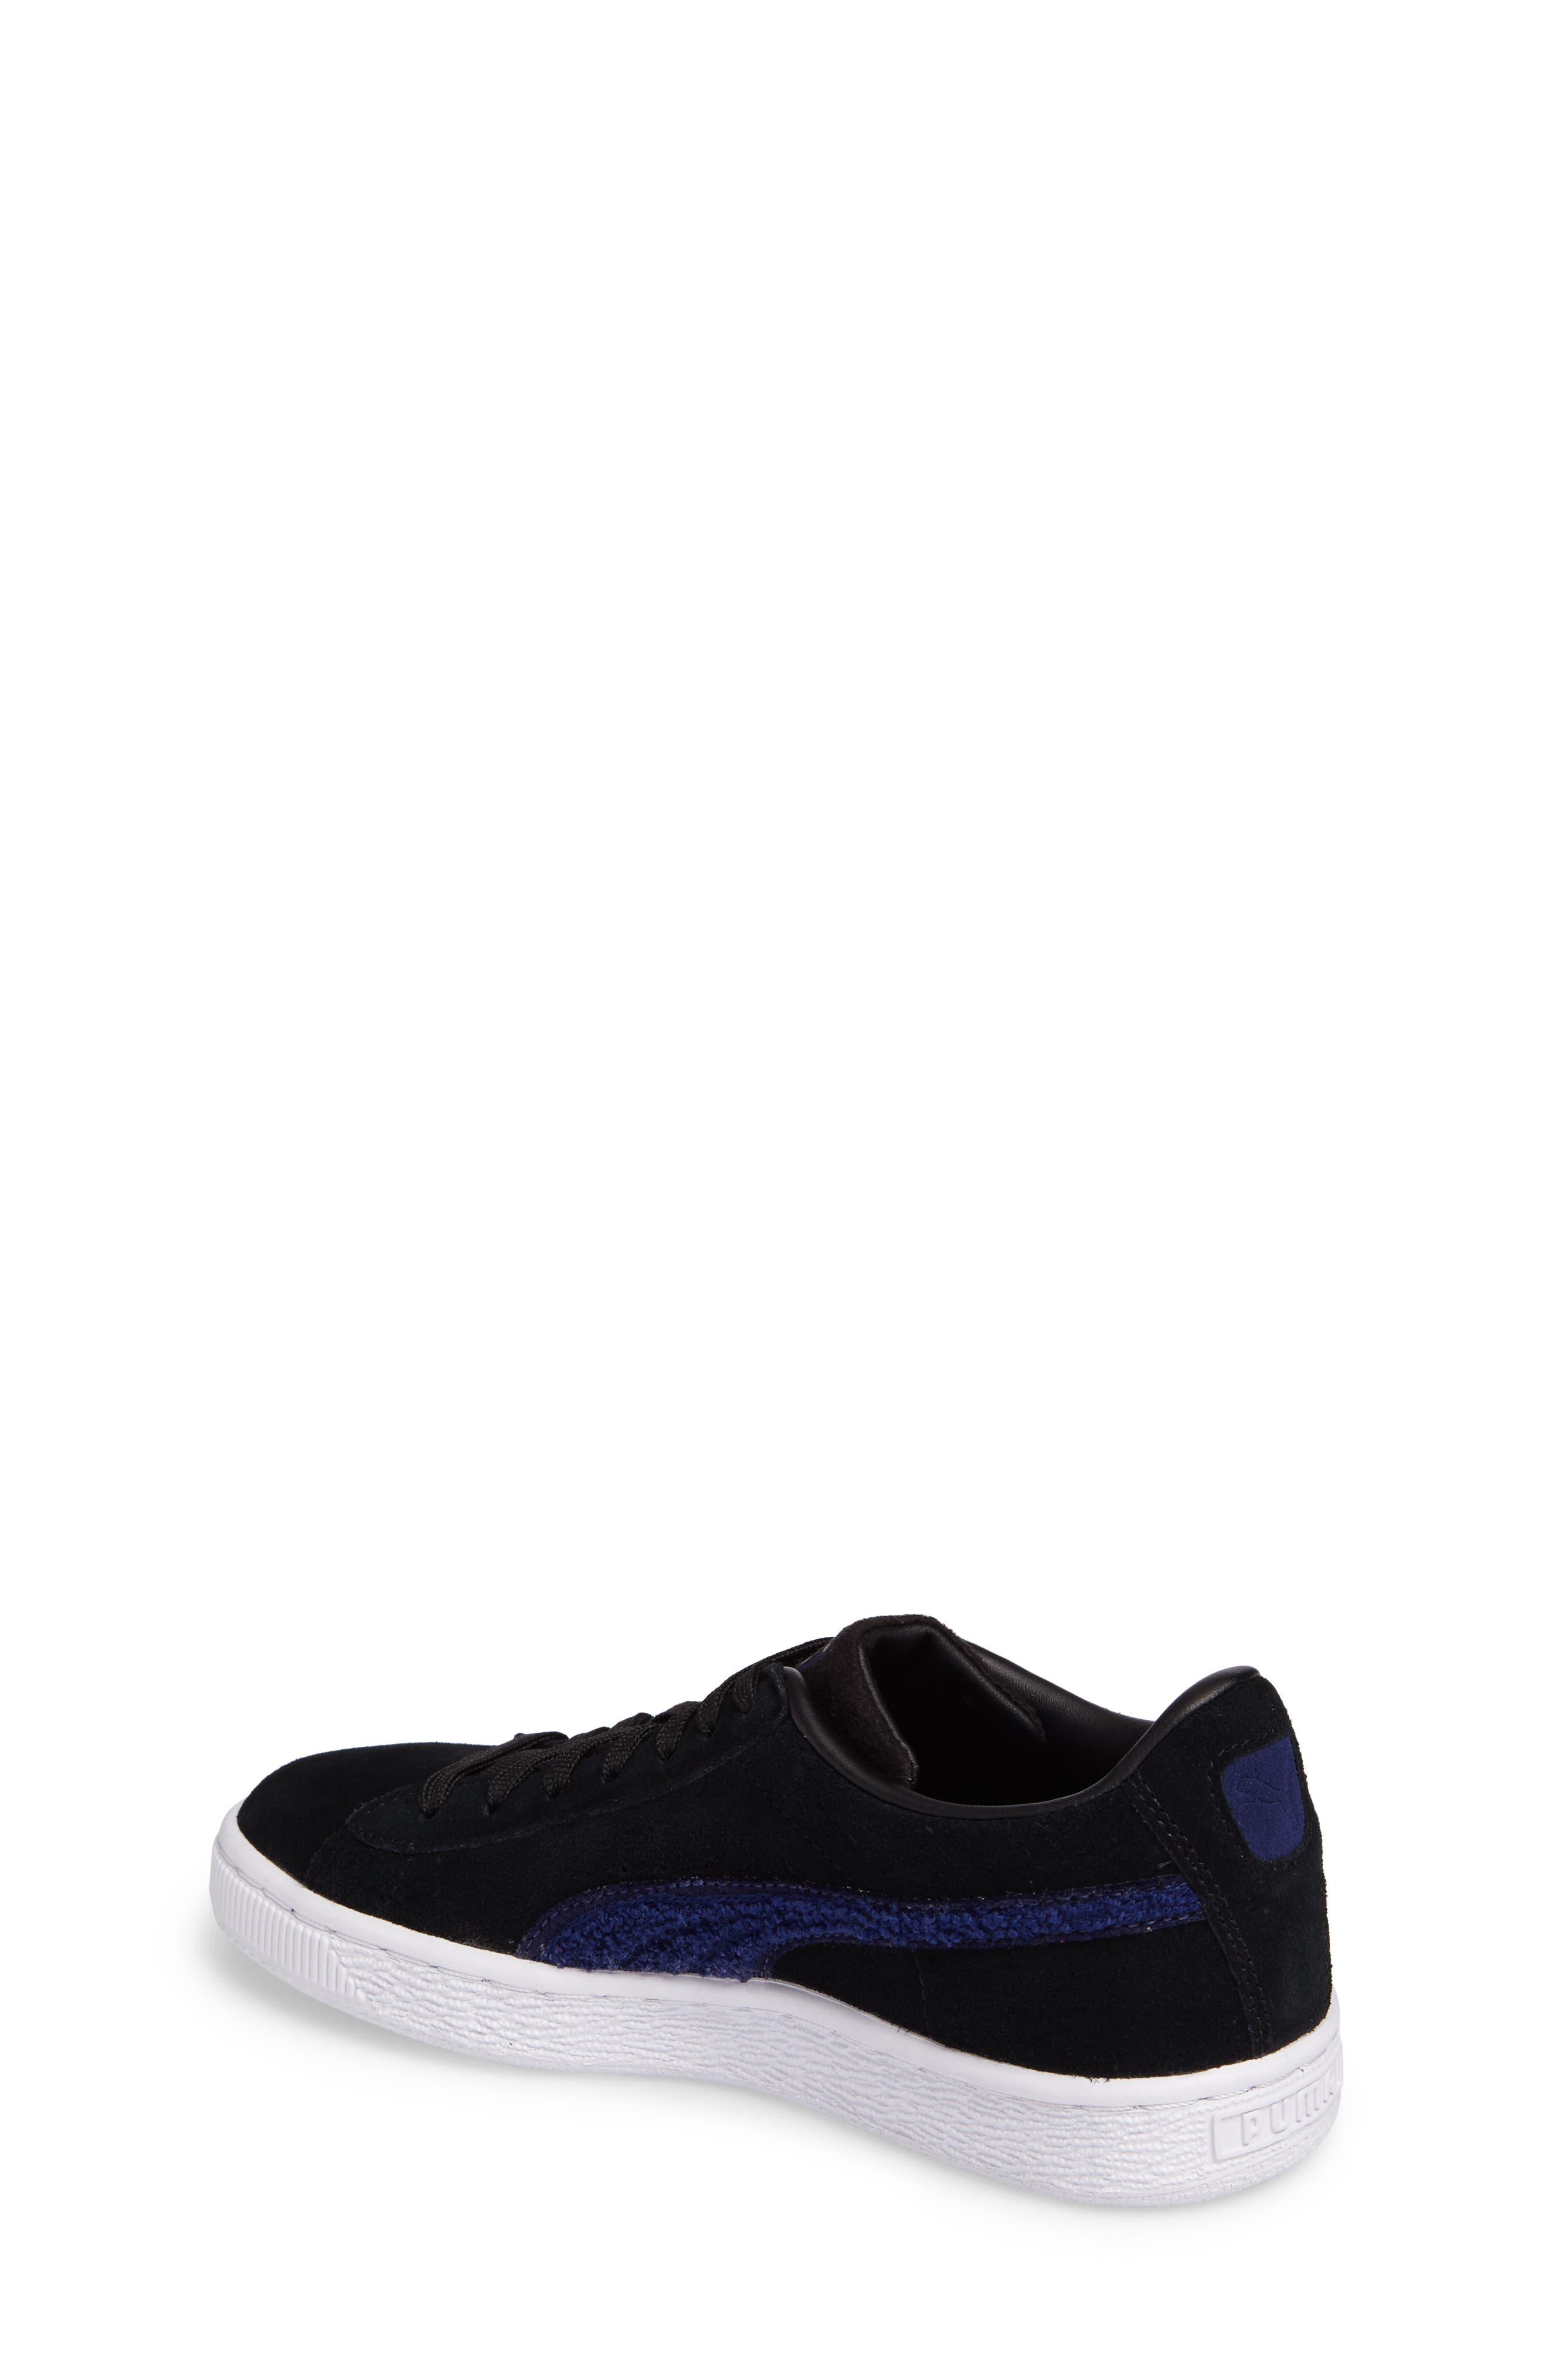 Classic Terry Jr Sneaker,                             Alternate thumbnail 2, color,                             Black